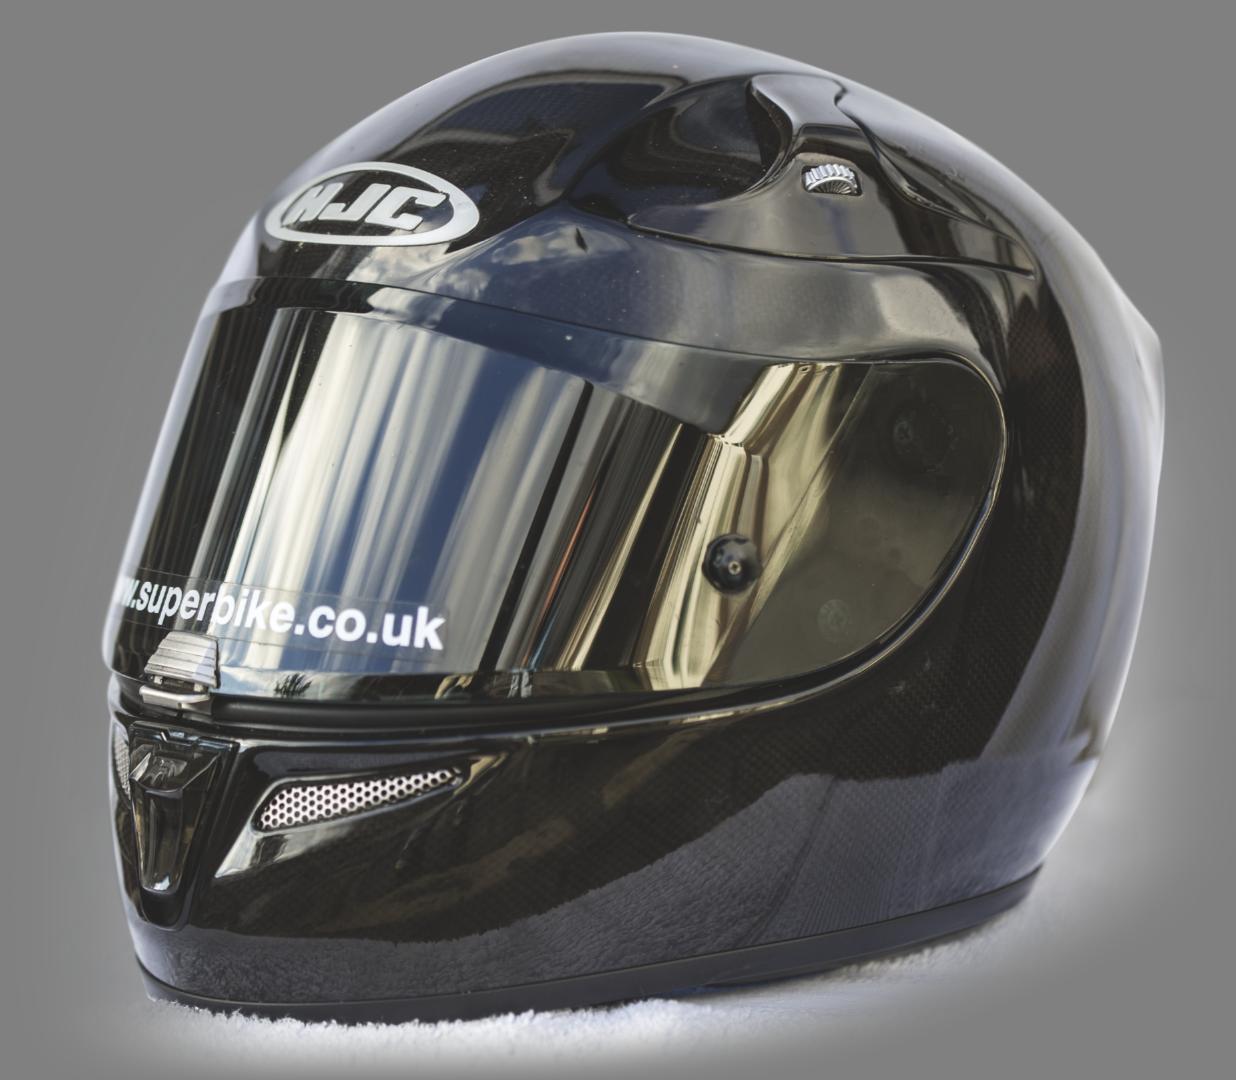 superbike magazine 39 s top 10 carbon fibre helmets superbike magazine. Black Bedroom Furniture Sets. Home Design Ideas